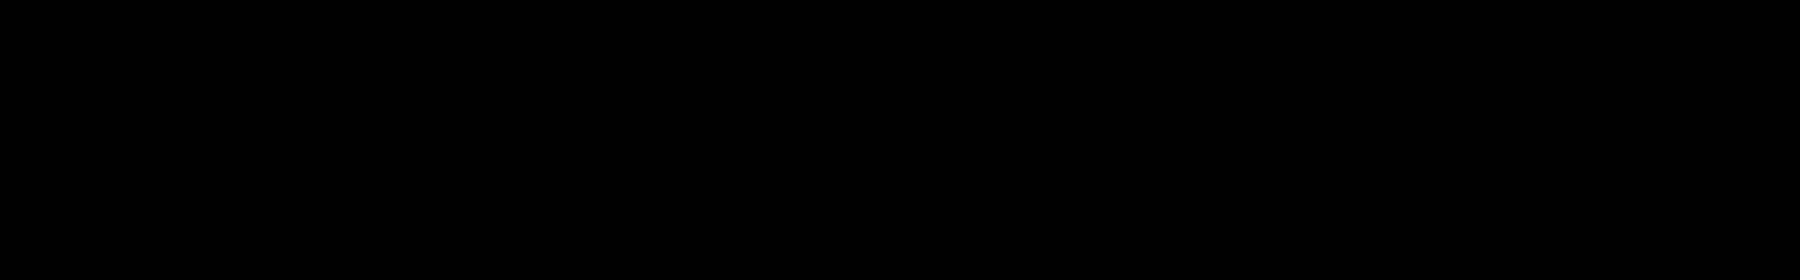 GLO-FI 4 audio waveform